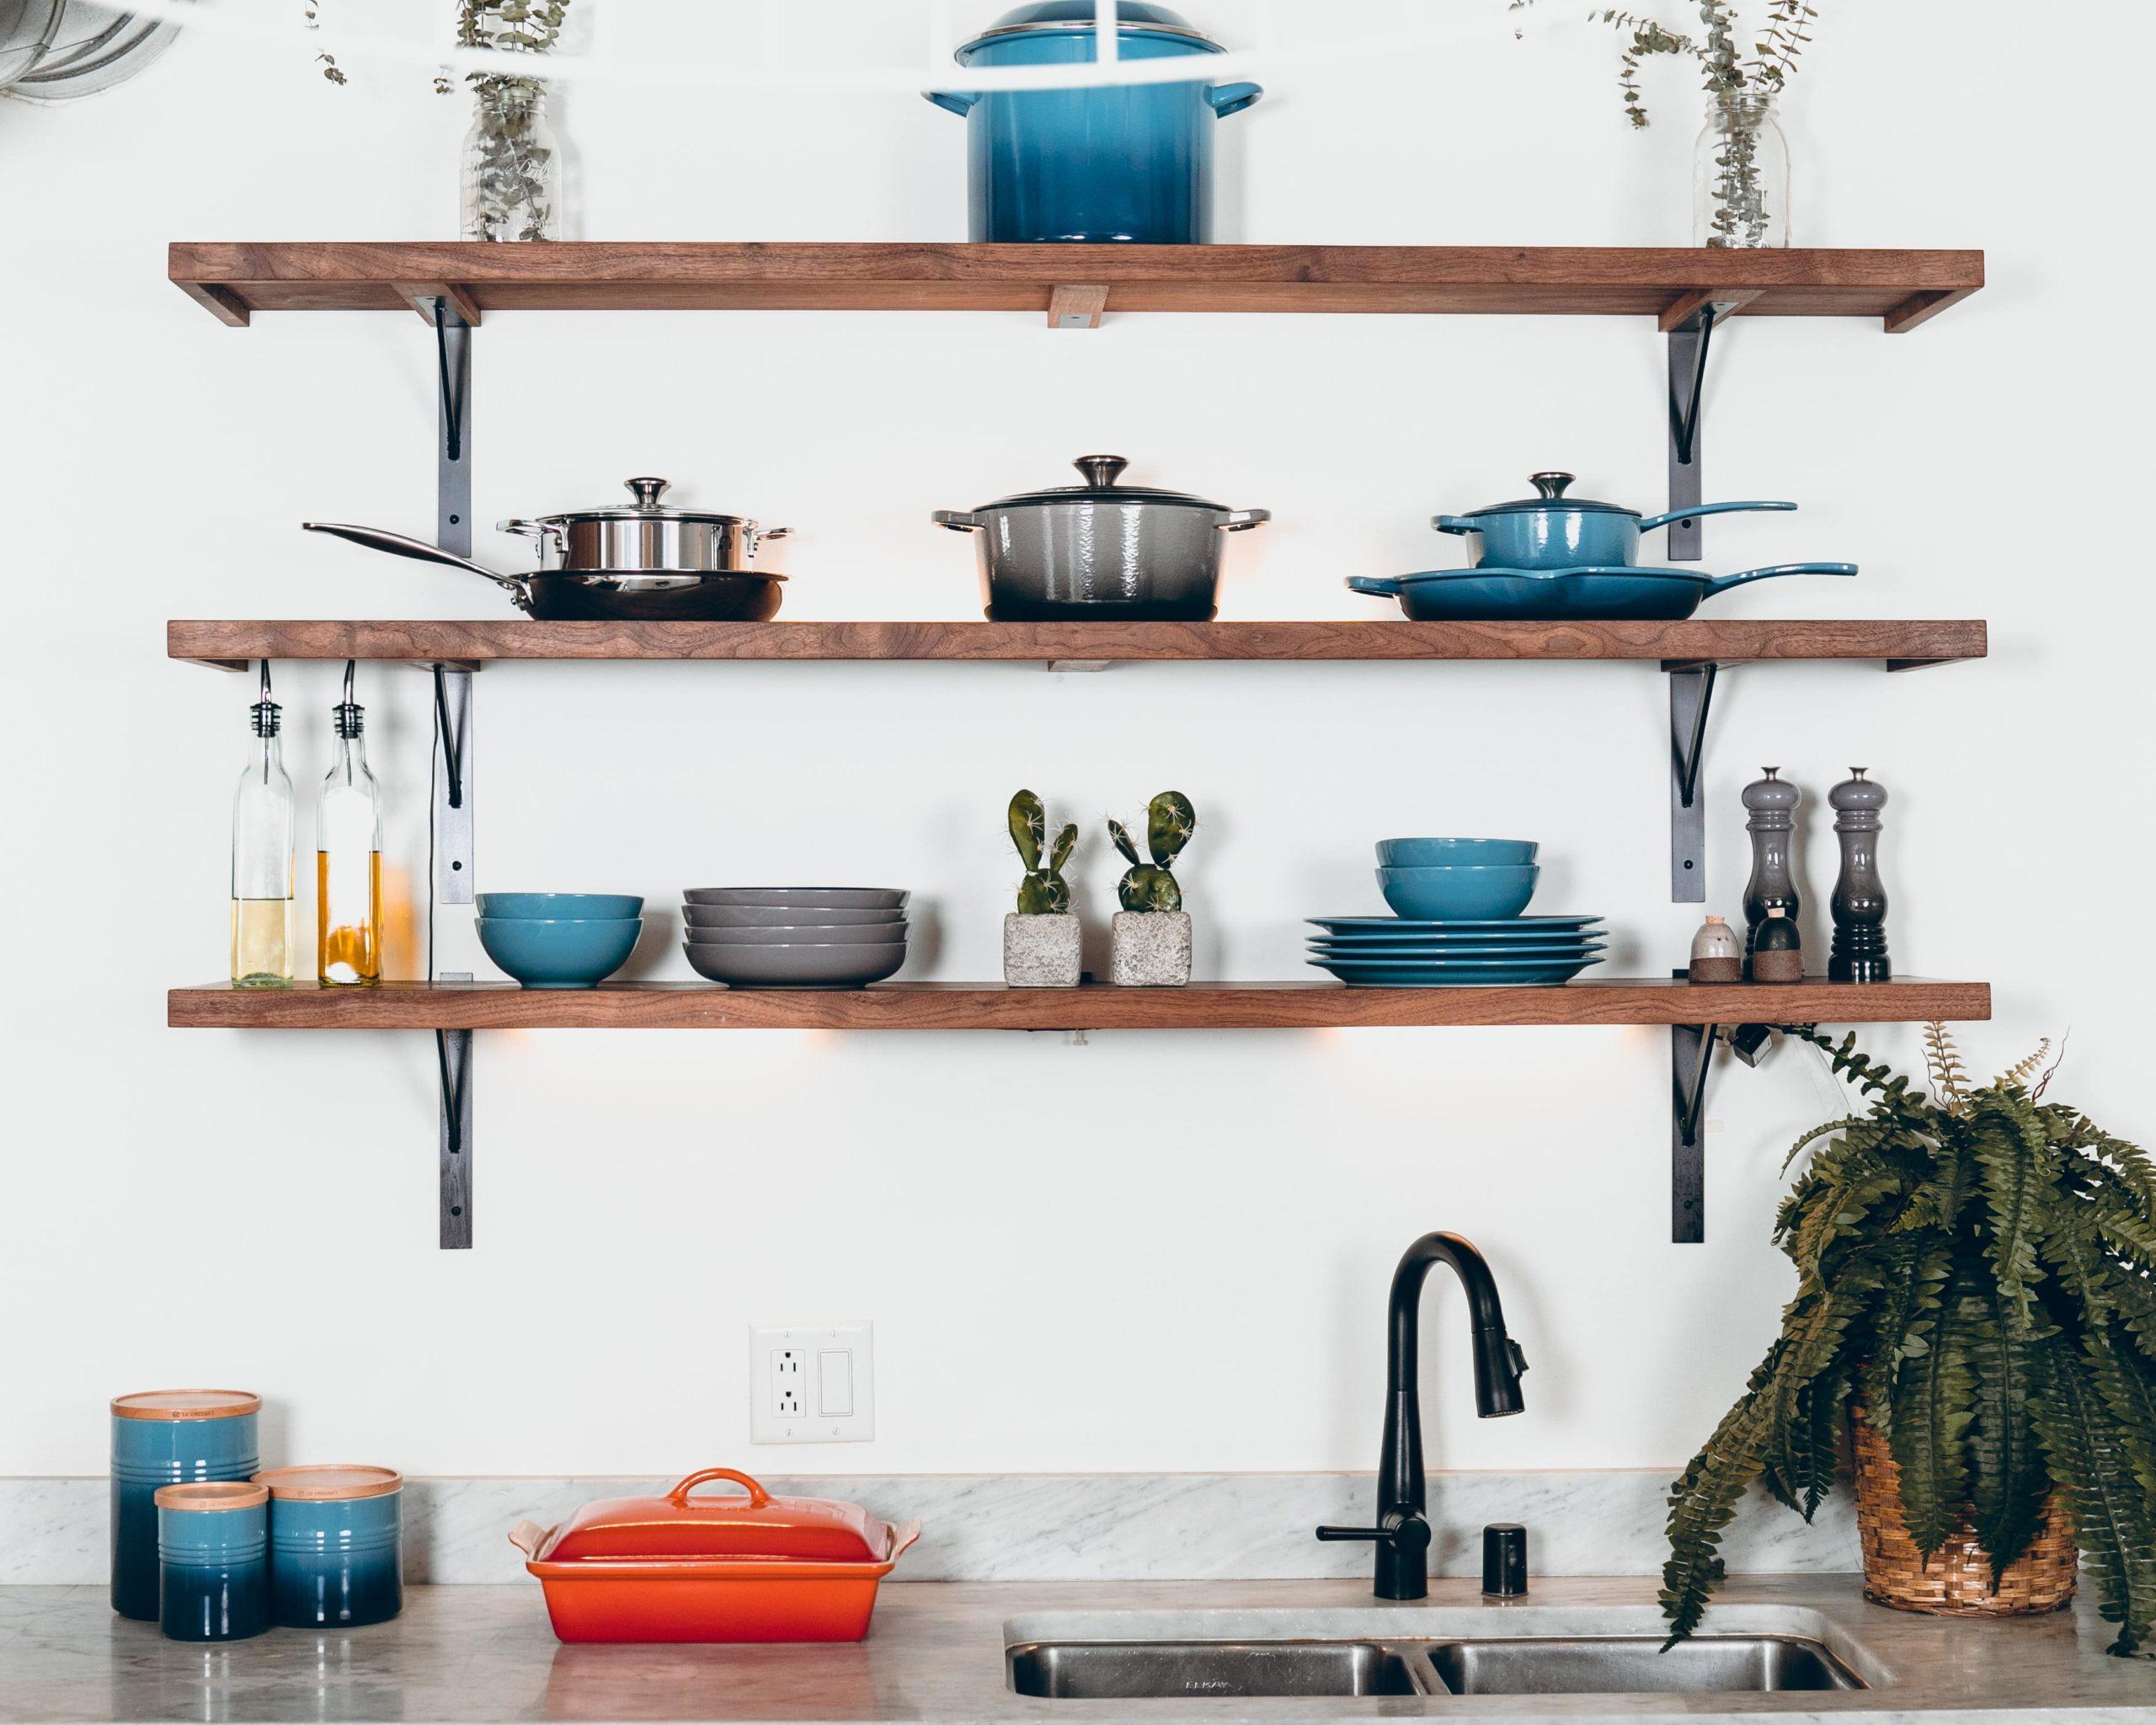 Blu Group - Servizi Immobiliari